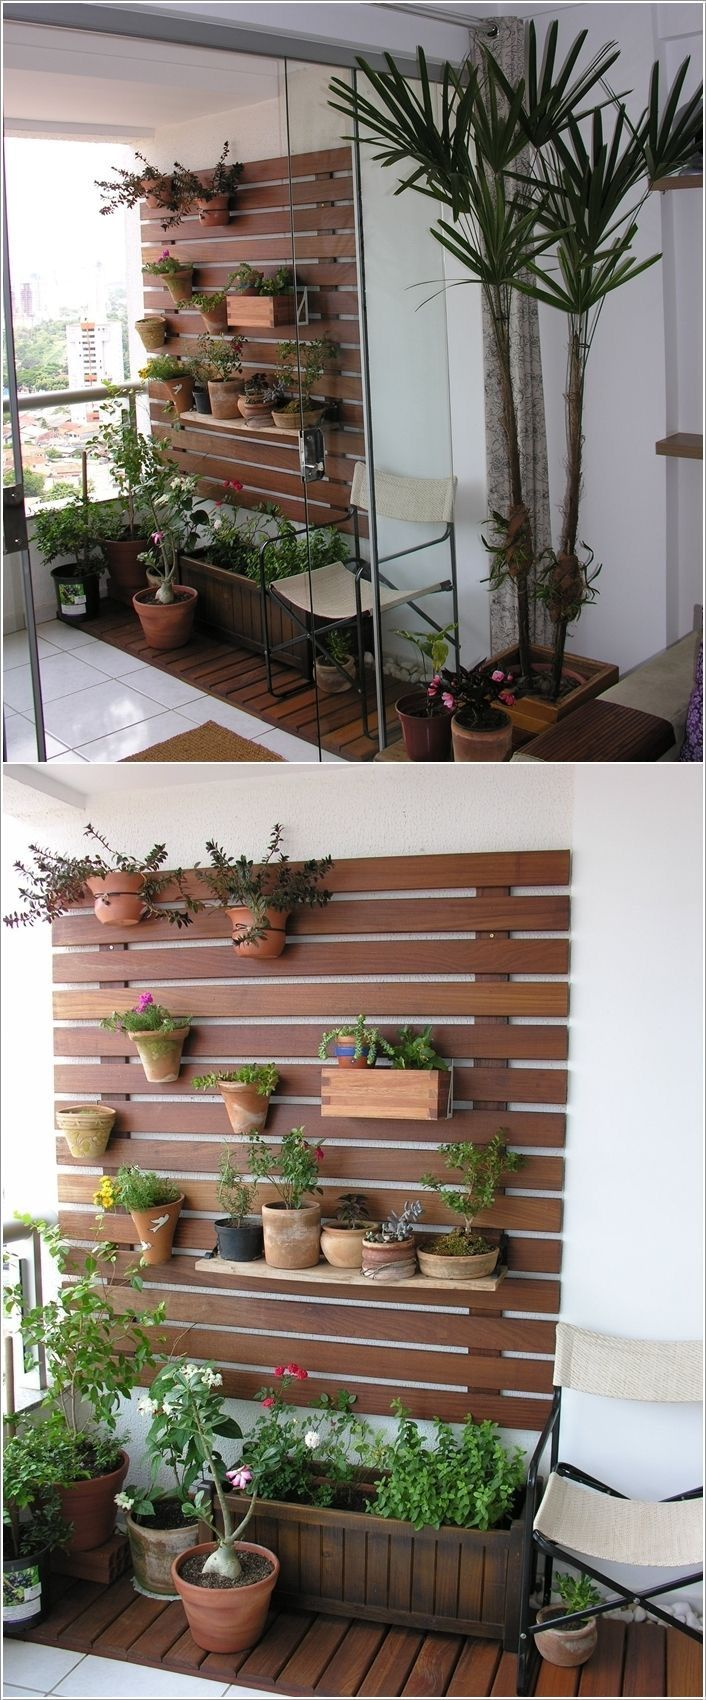 Pin de Carmen Mina Mulato en jardineria | Pinterest | Jardines ...